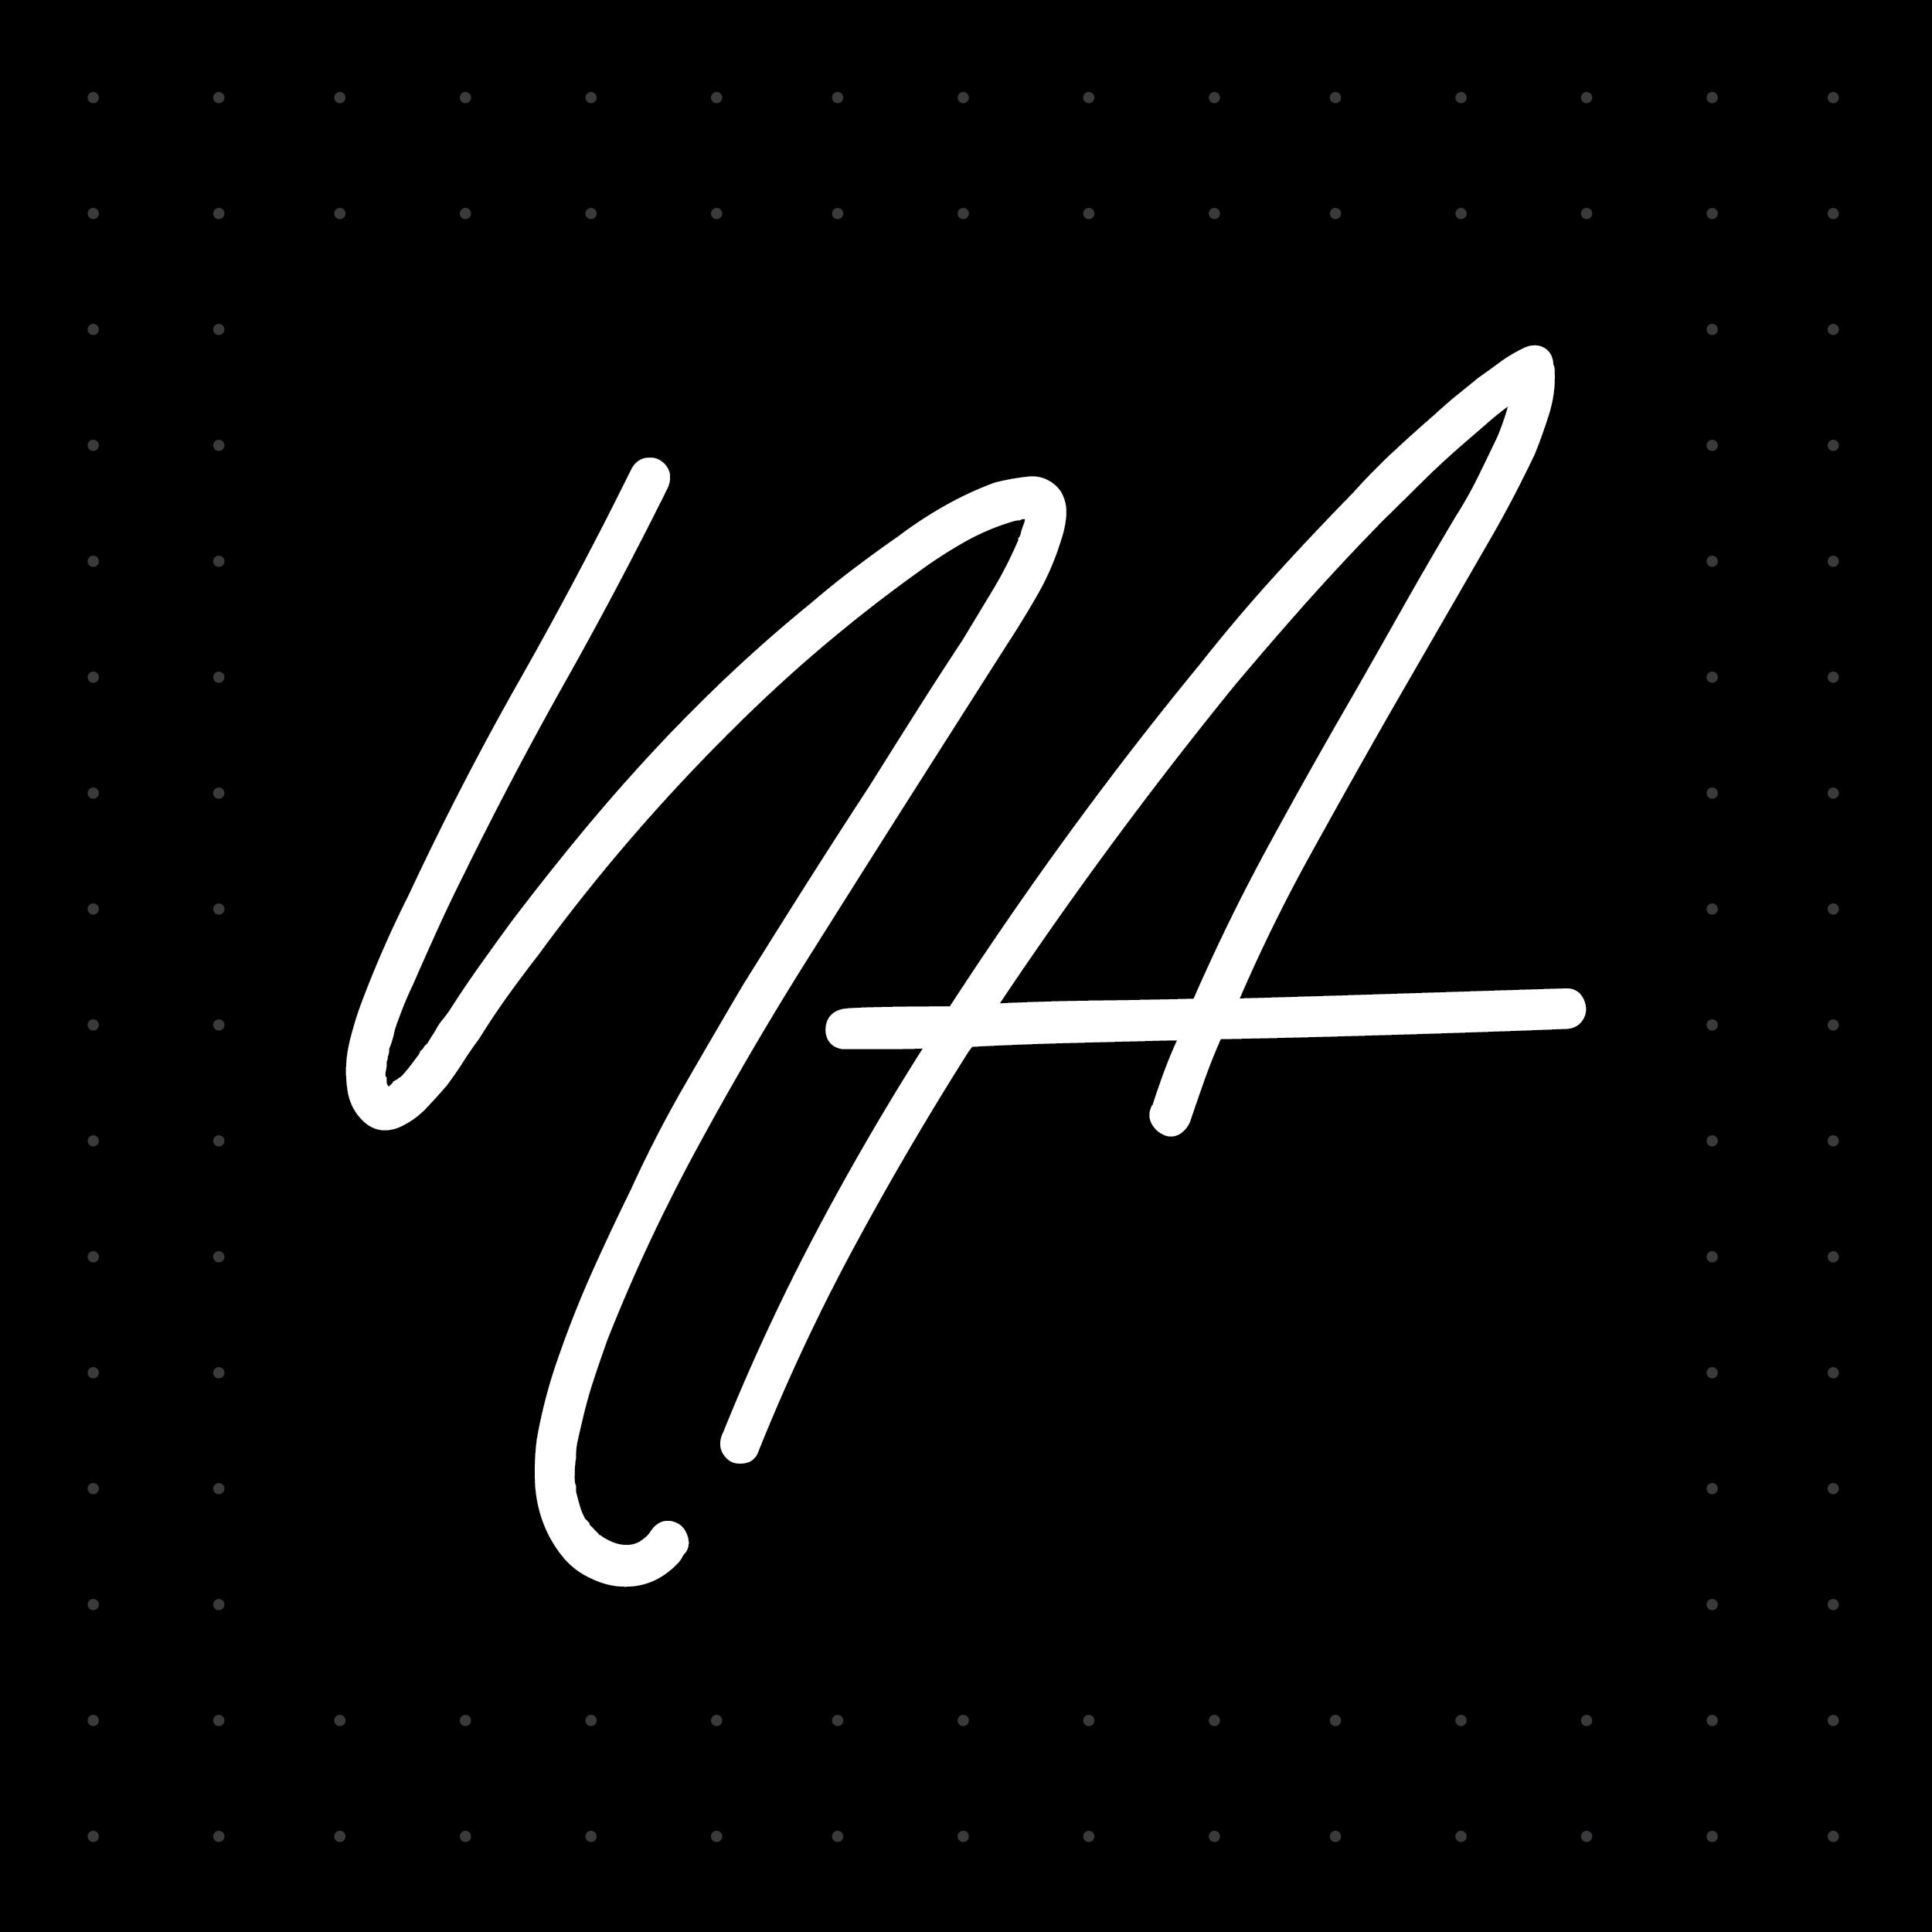 Navshake Arora logo. White handwritten N and A on a black background.